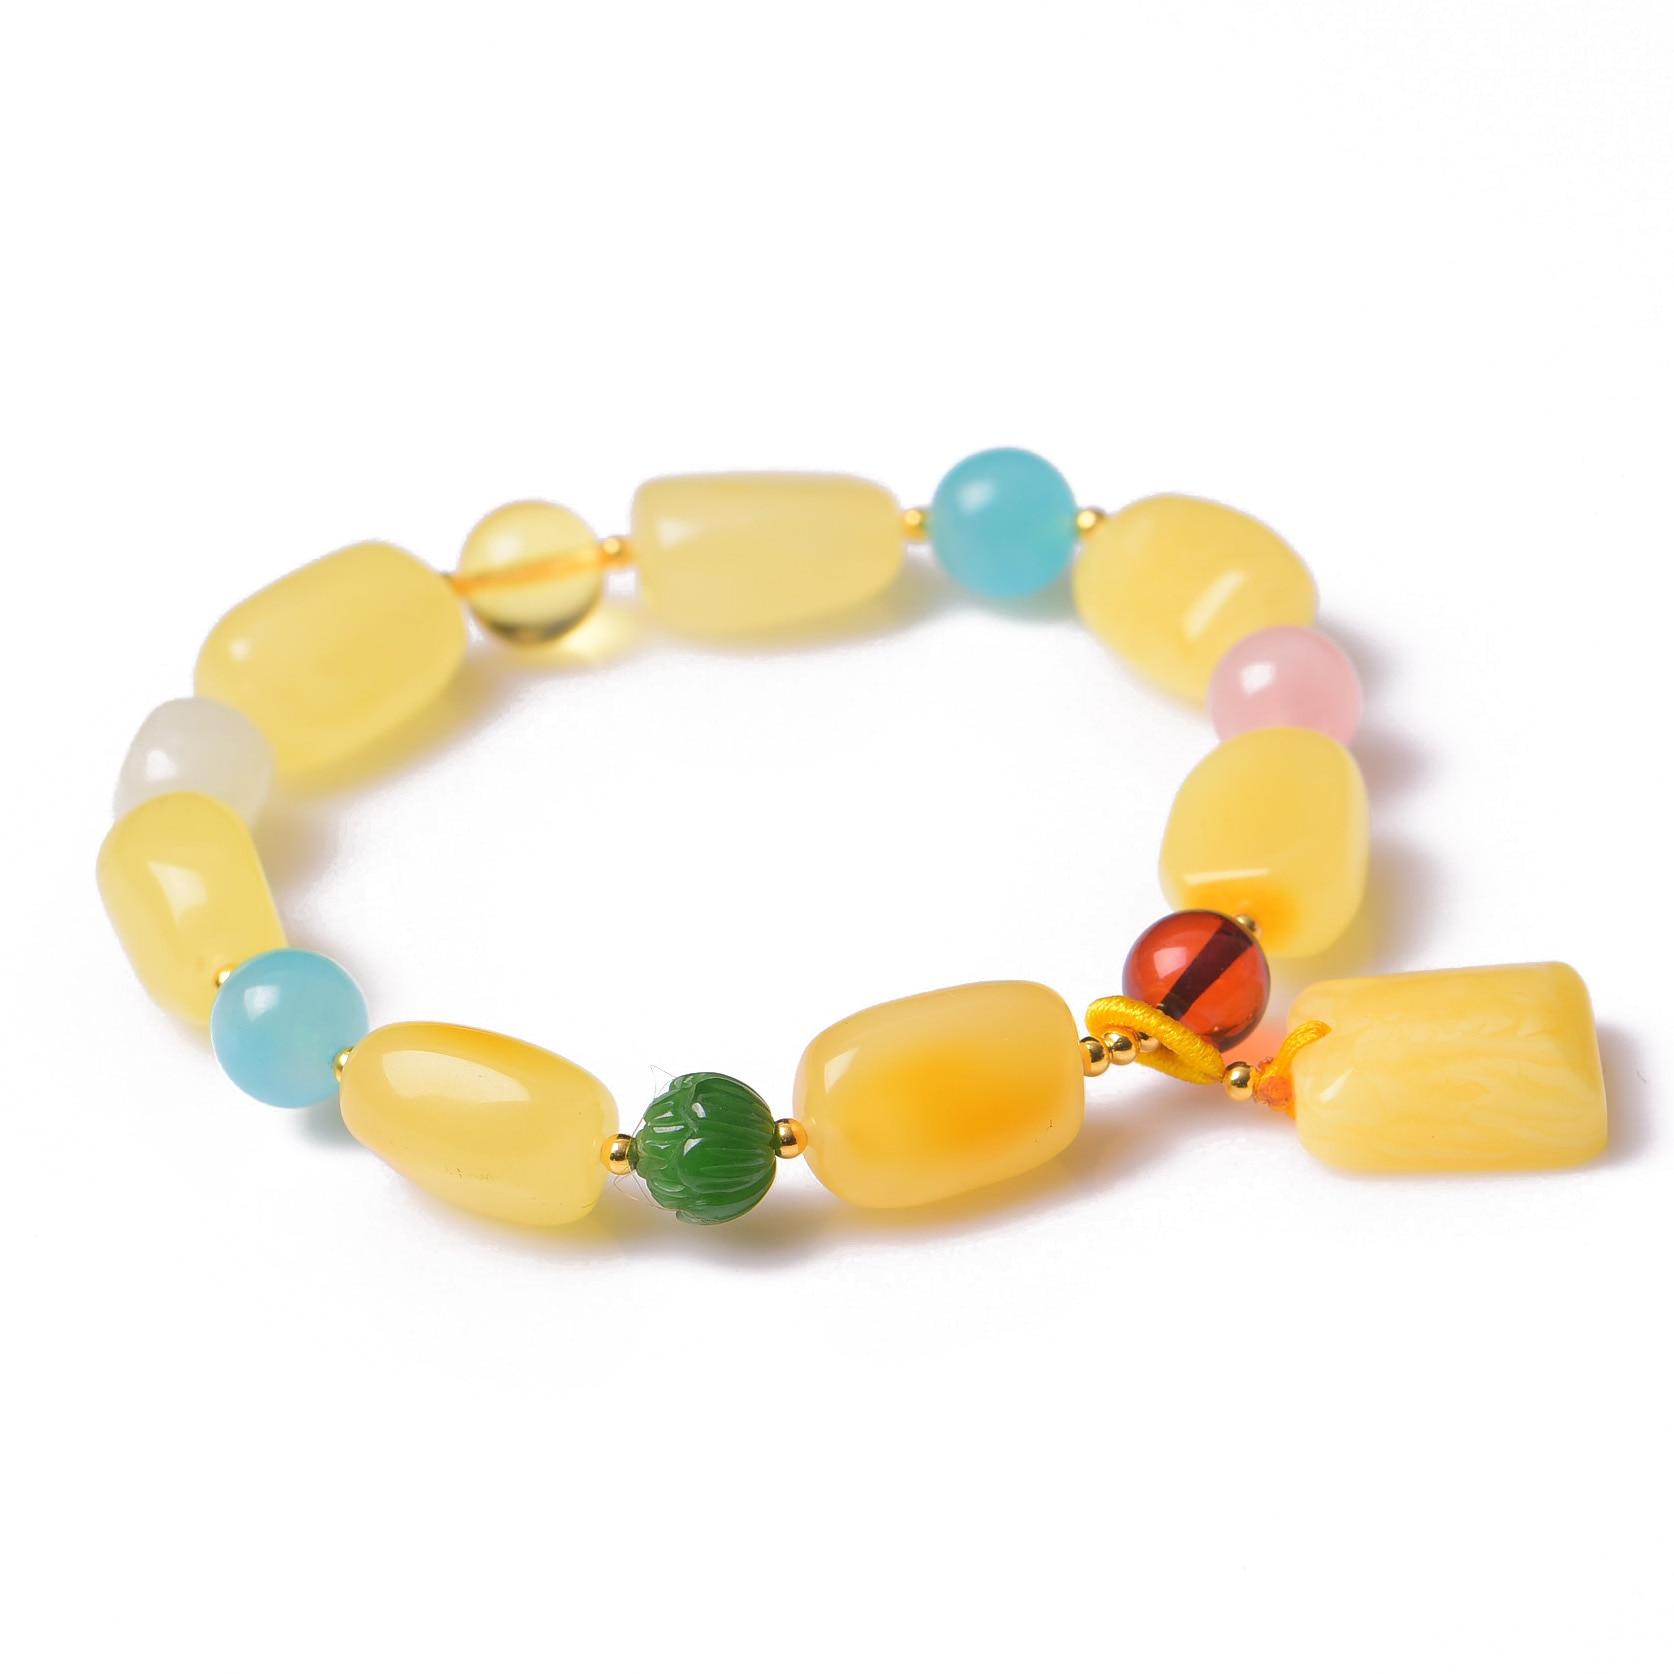 Handmade Authentic Wax Crystal Beads Bracelets